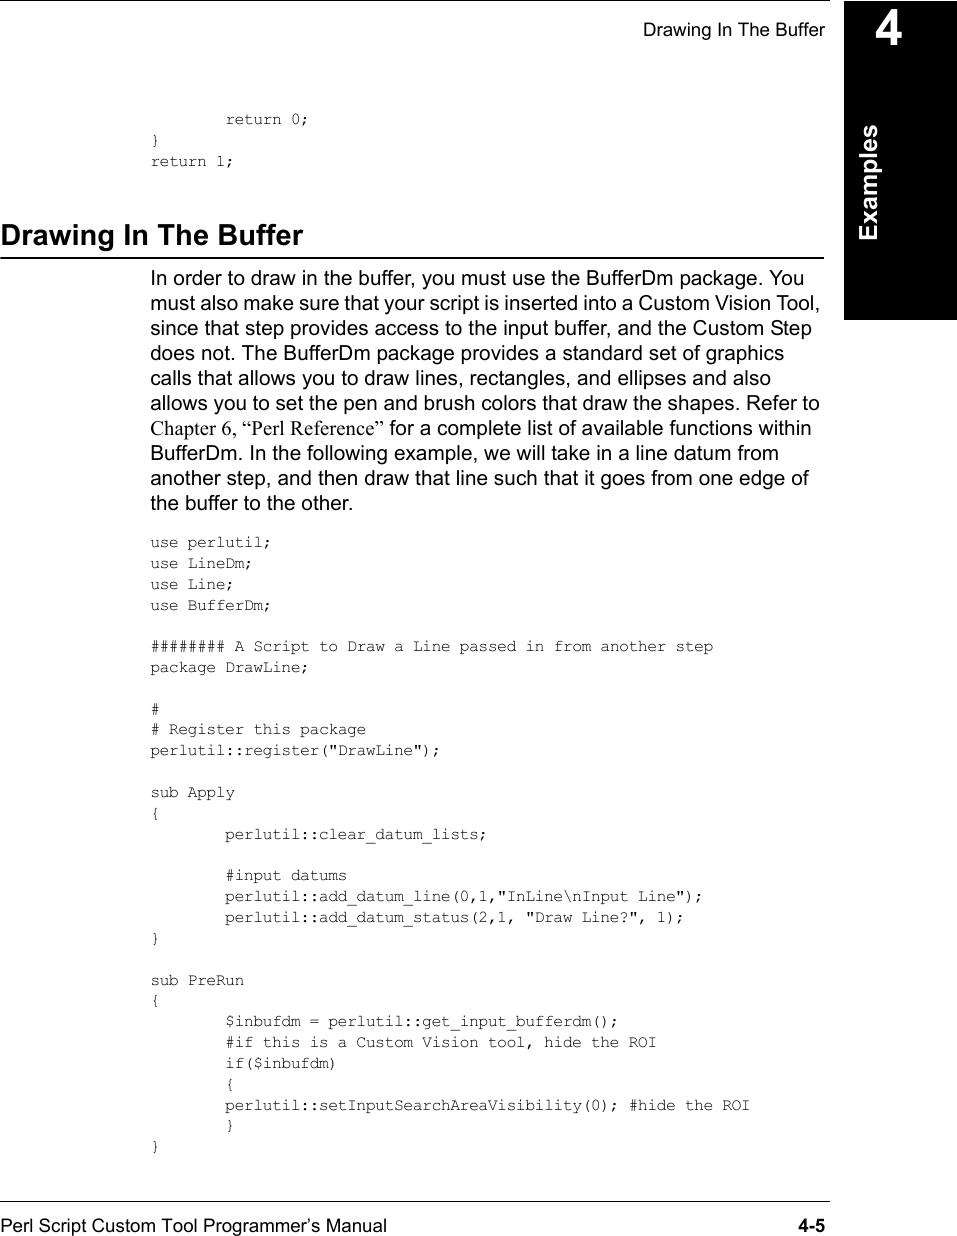 Visionscape Perl Script Custom Tool Programmer's Manual